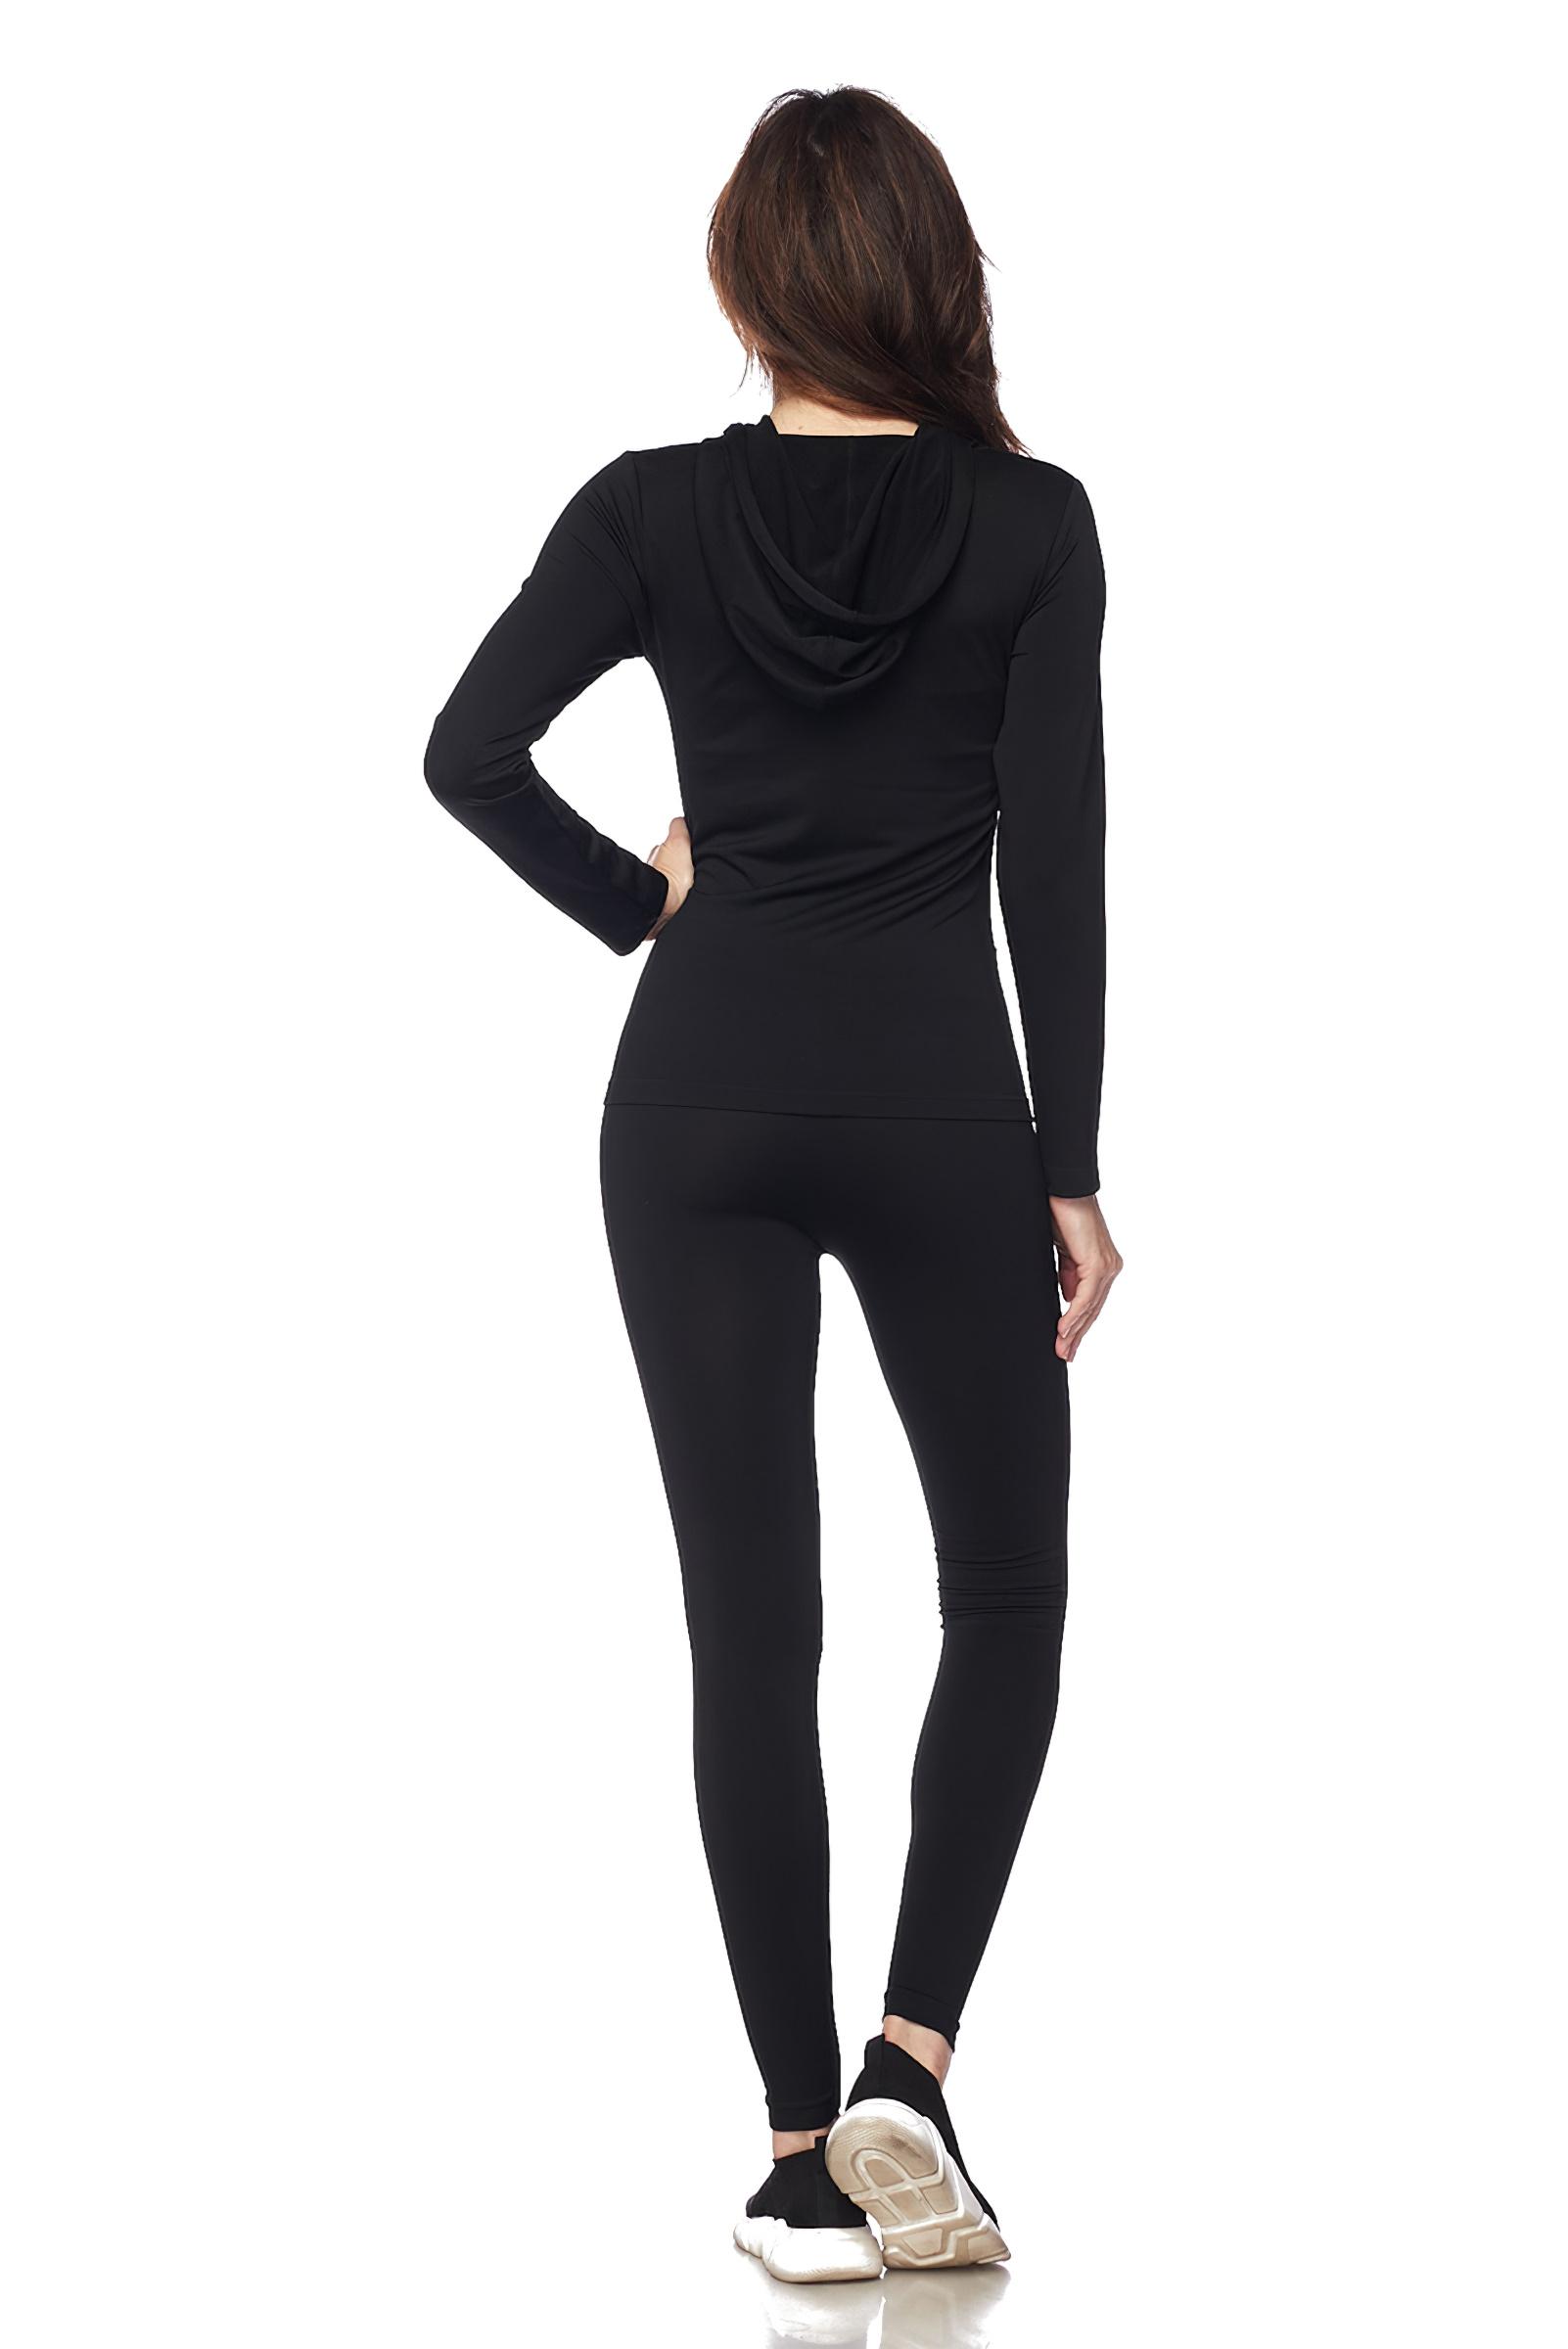 Women-039-s-Juniors-Active-Set-Wear-Zip-Up-Hoodie-and-Legging thumbnail 10